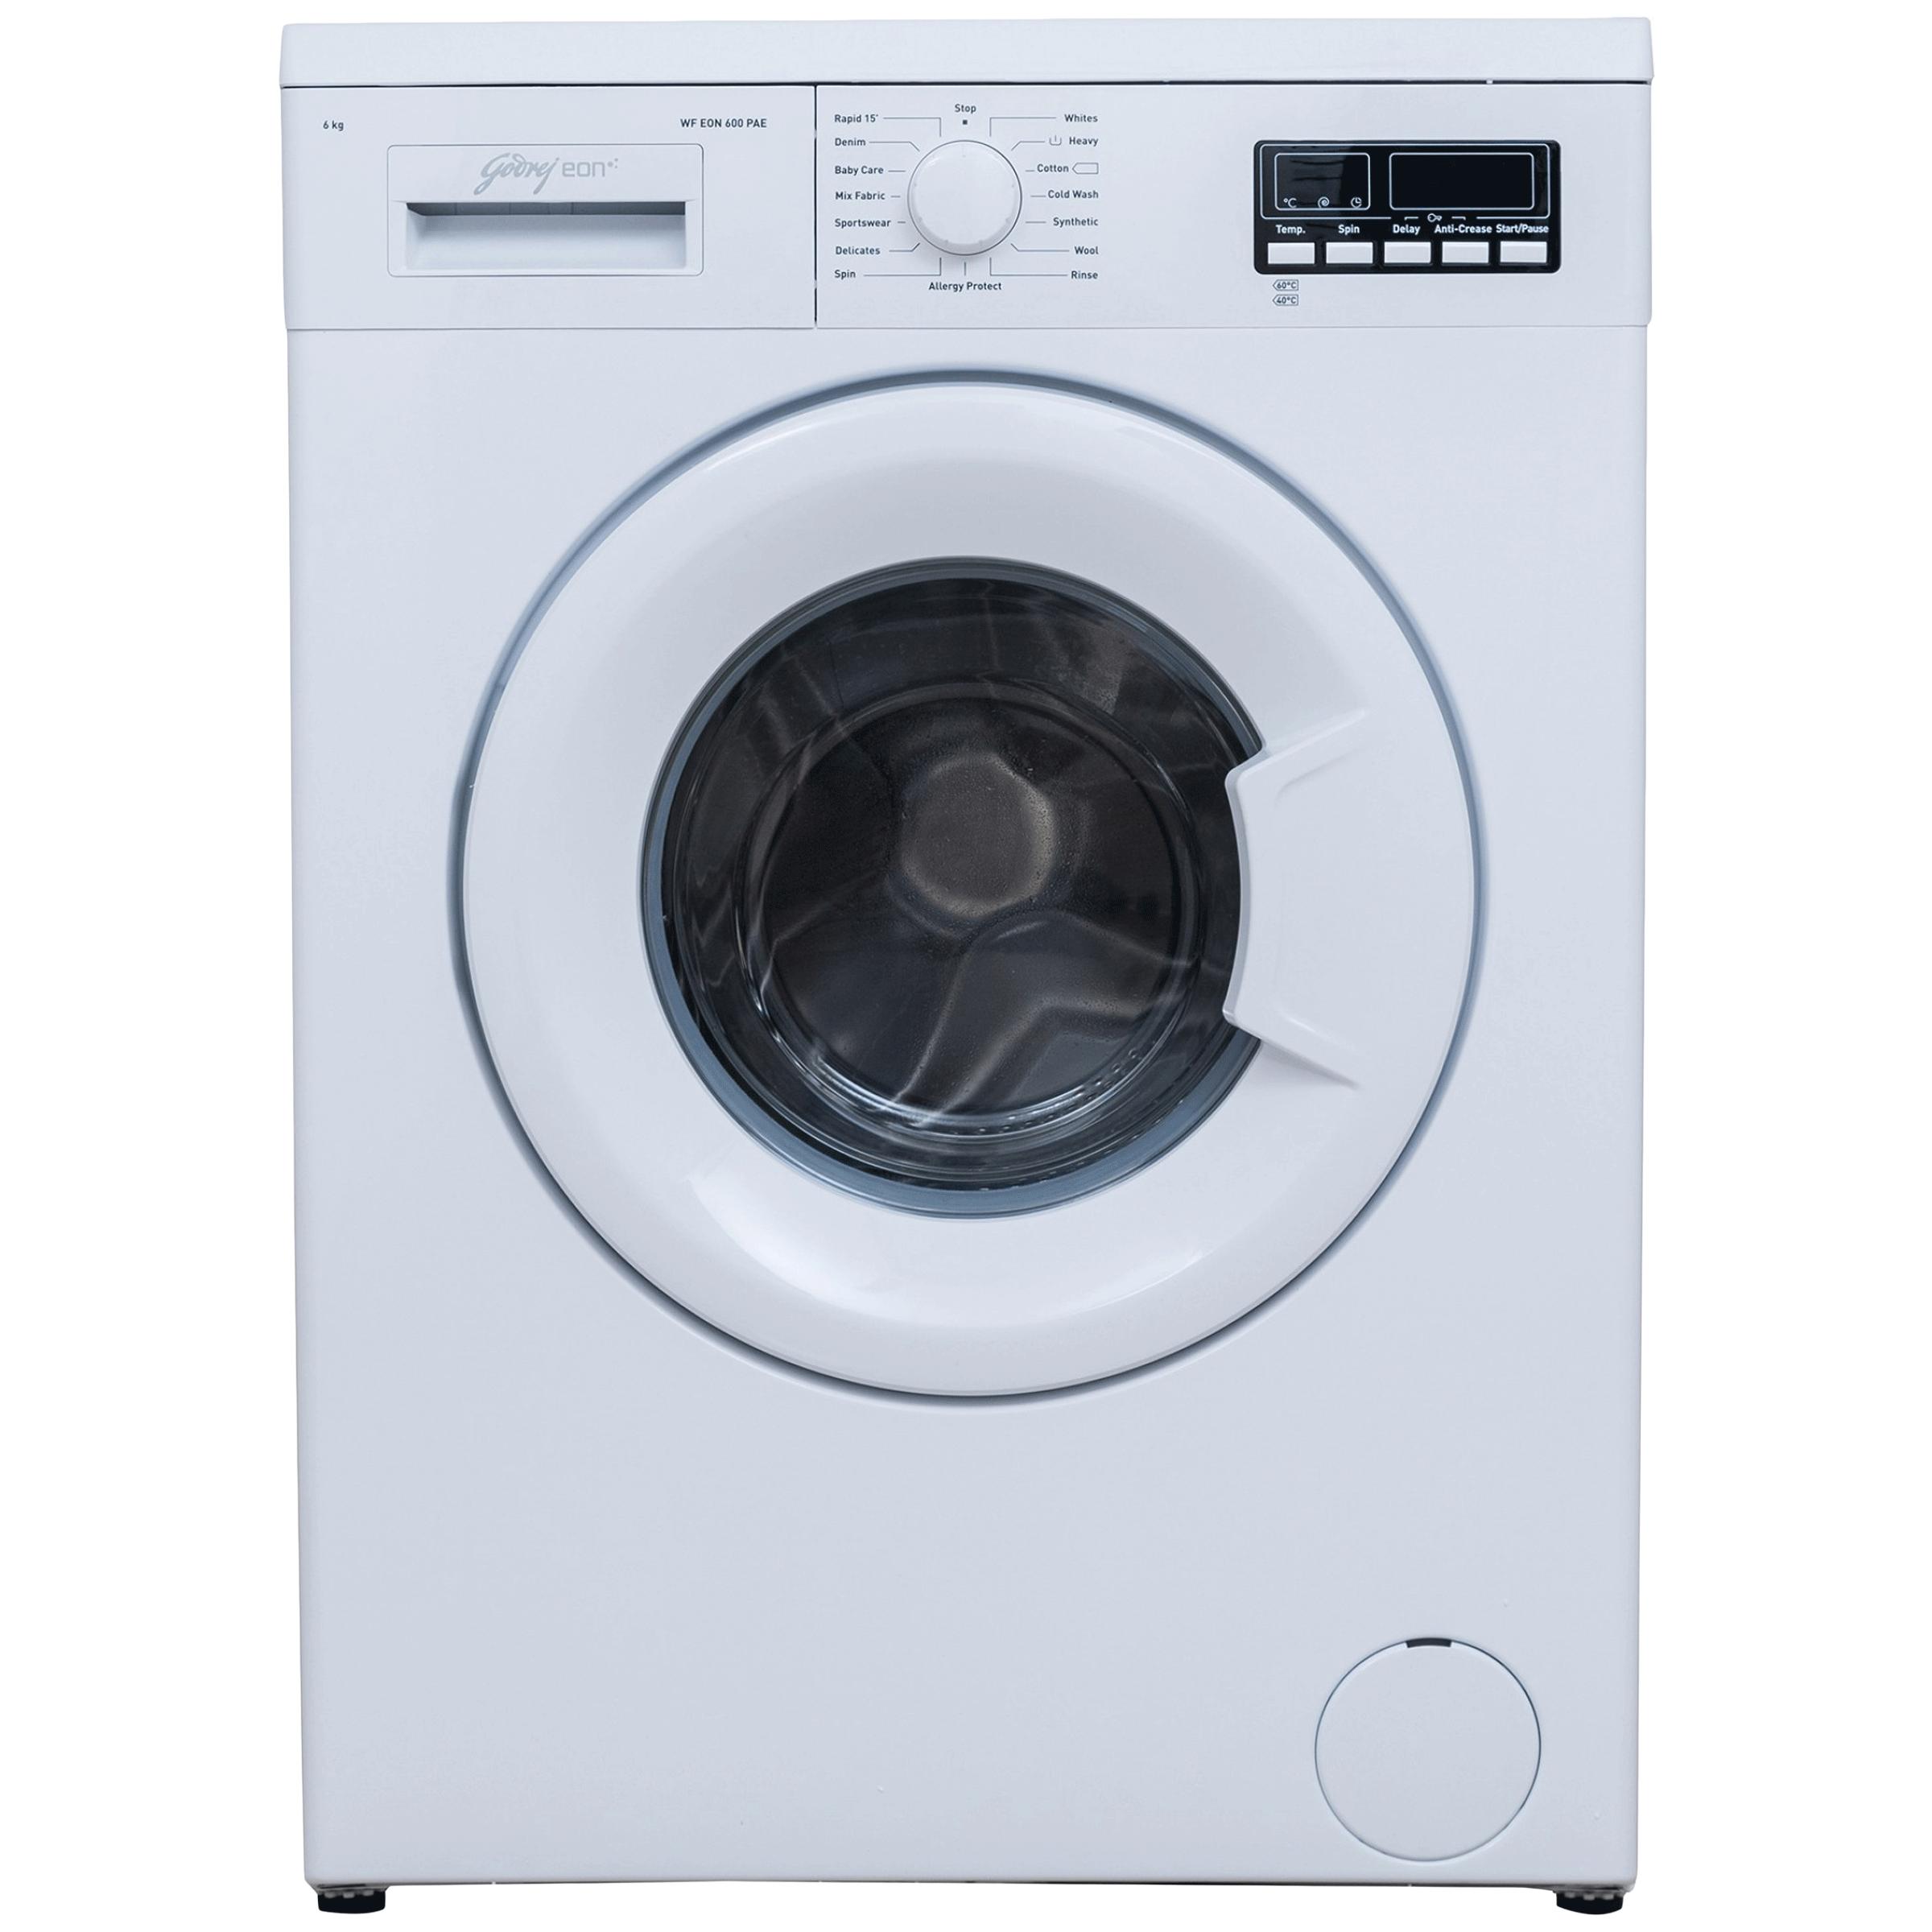 Godrej Eon 6 kg 5 Star Fully Automatic Front Load Washing Machine (Eco-Balance System, WF Eon 600 PAE, White)_1